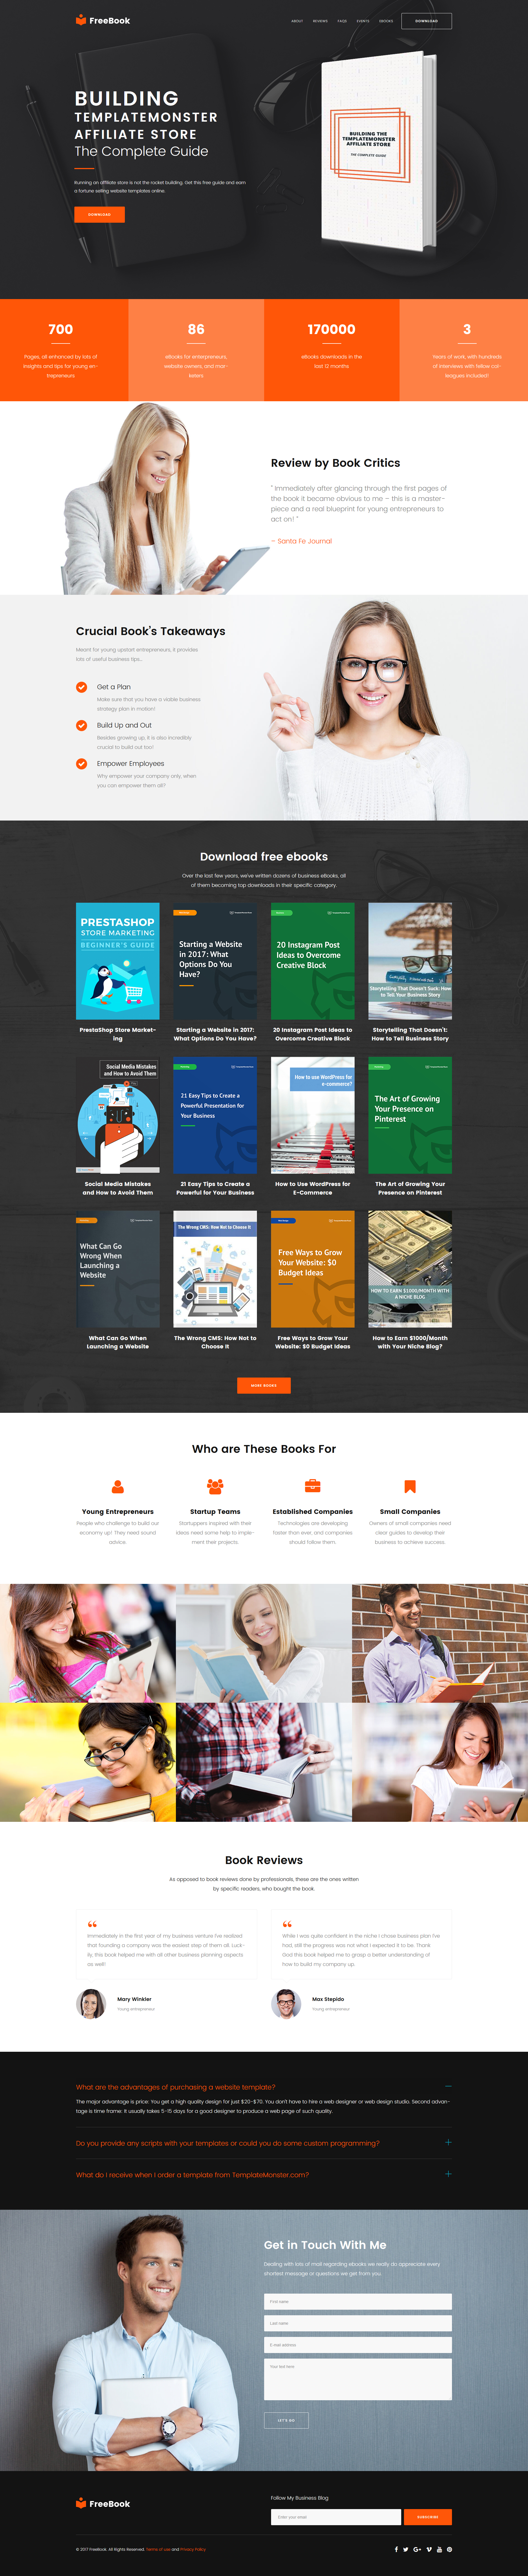 Website Design Template 64763 - blogging landing education books startap company